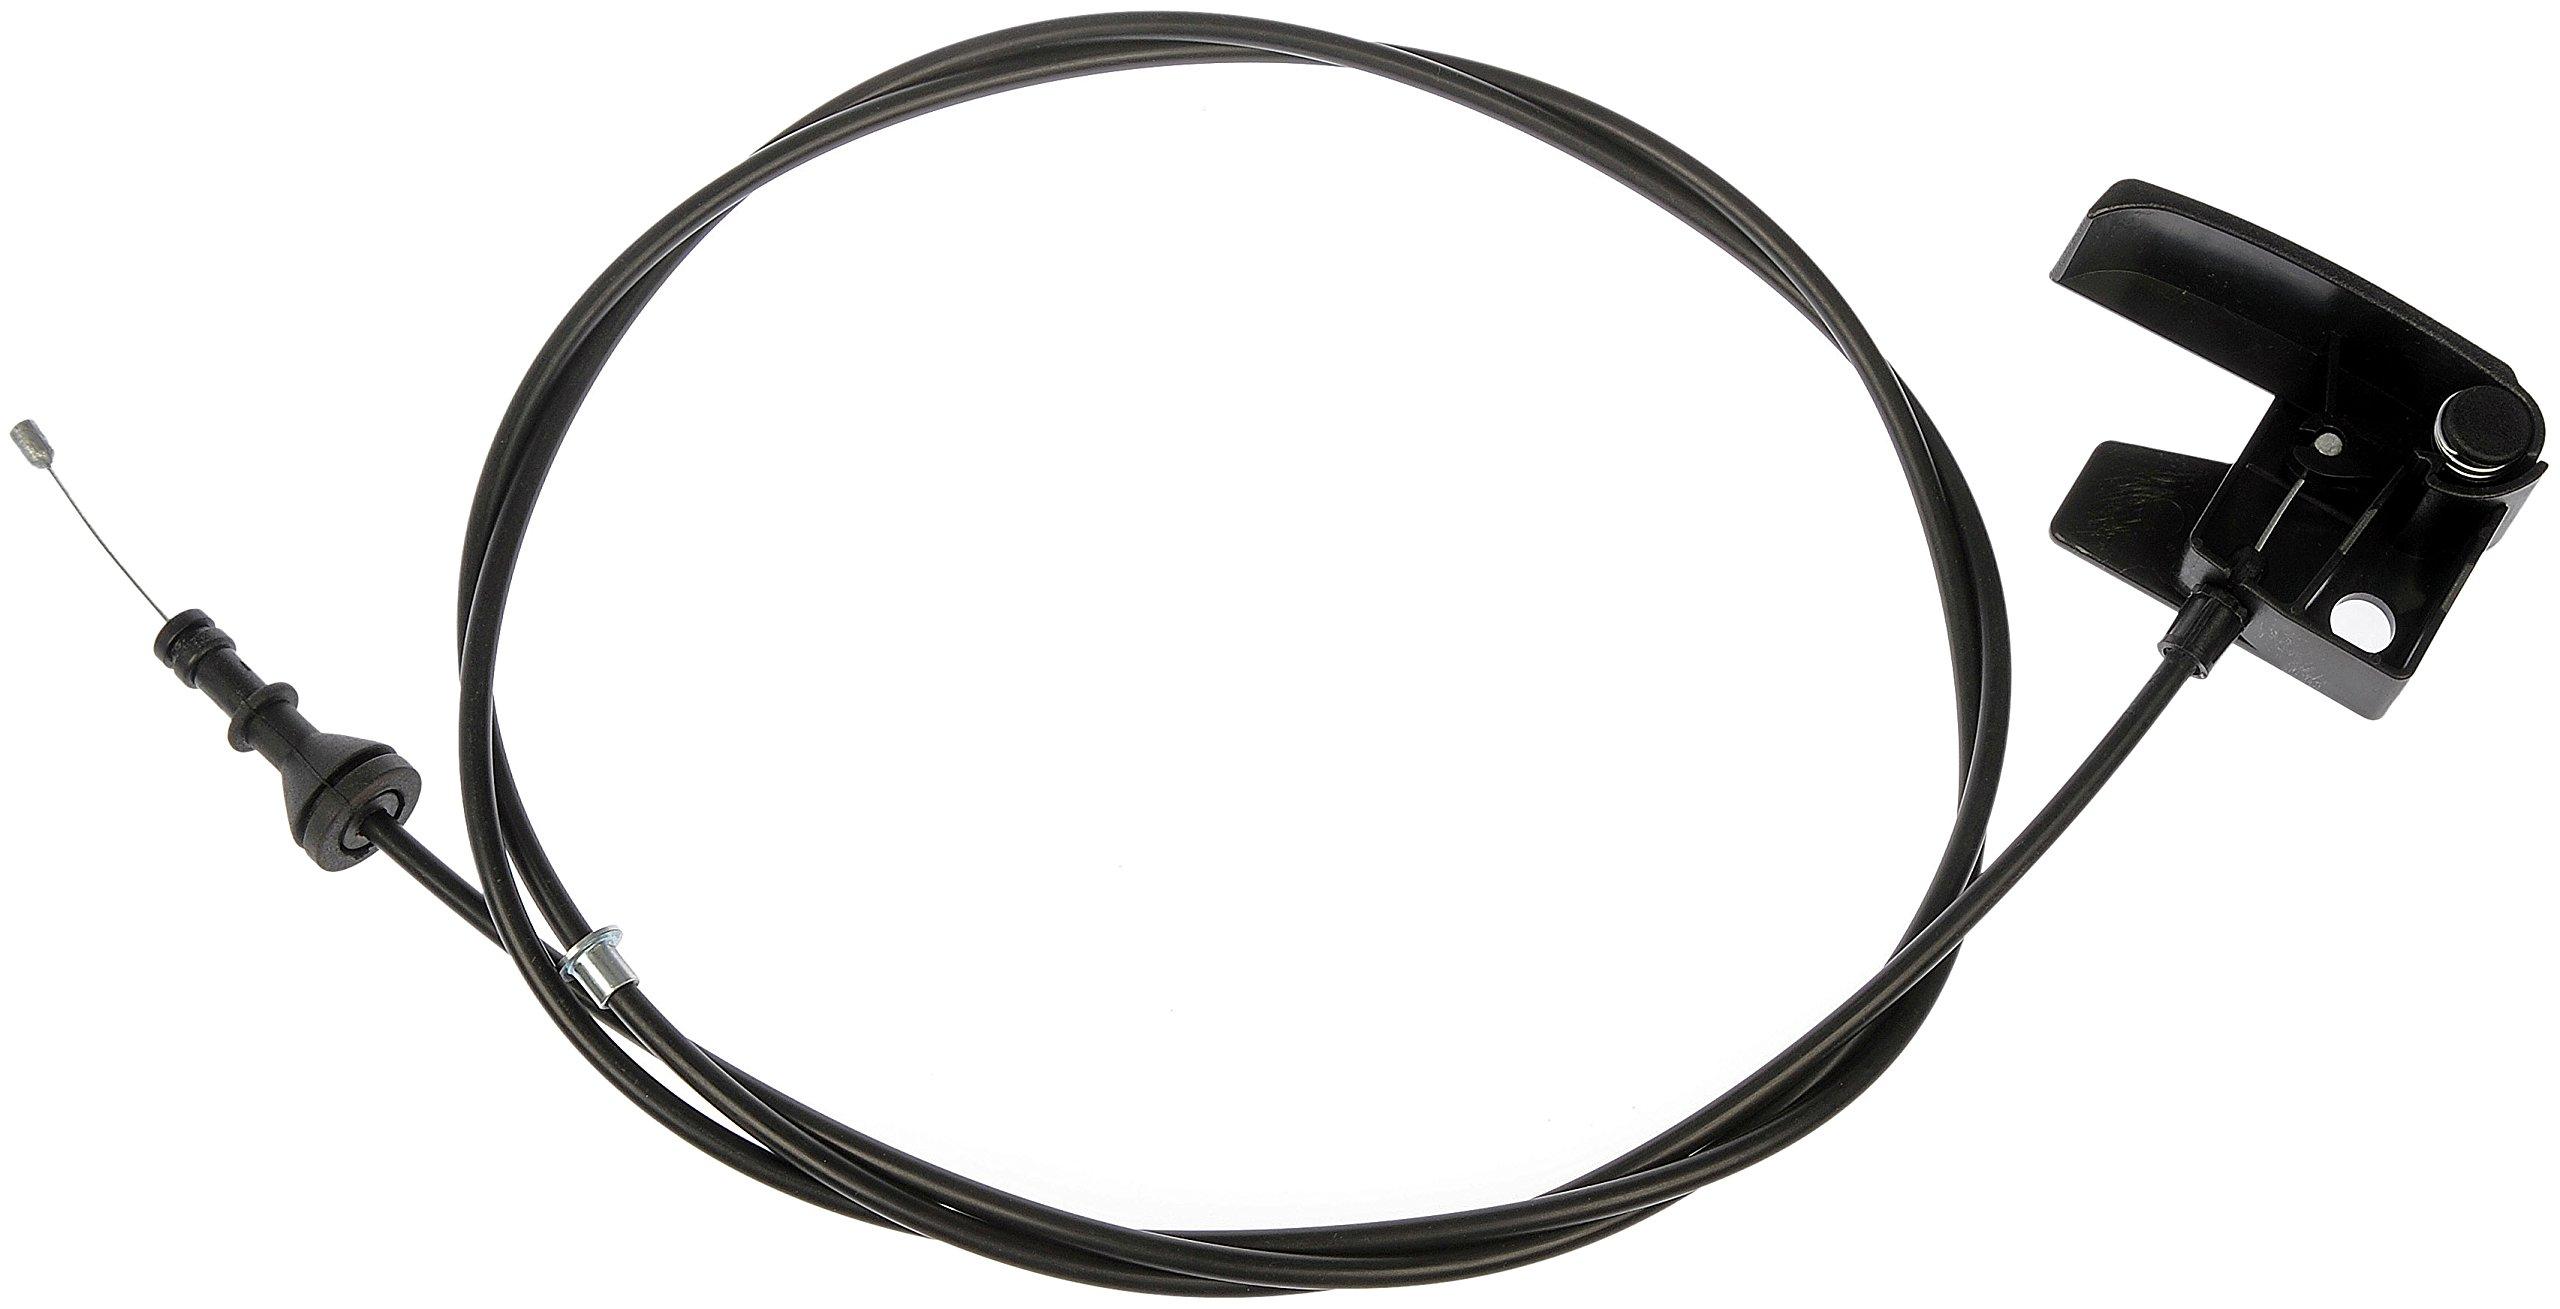 Dorman 912-014 Hood Release Cable